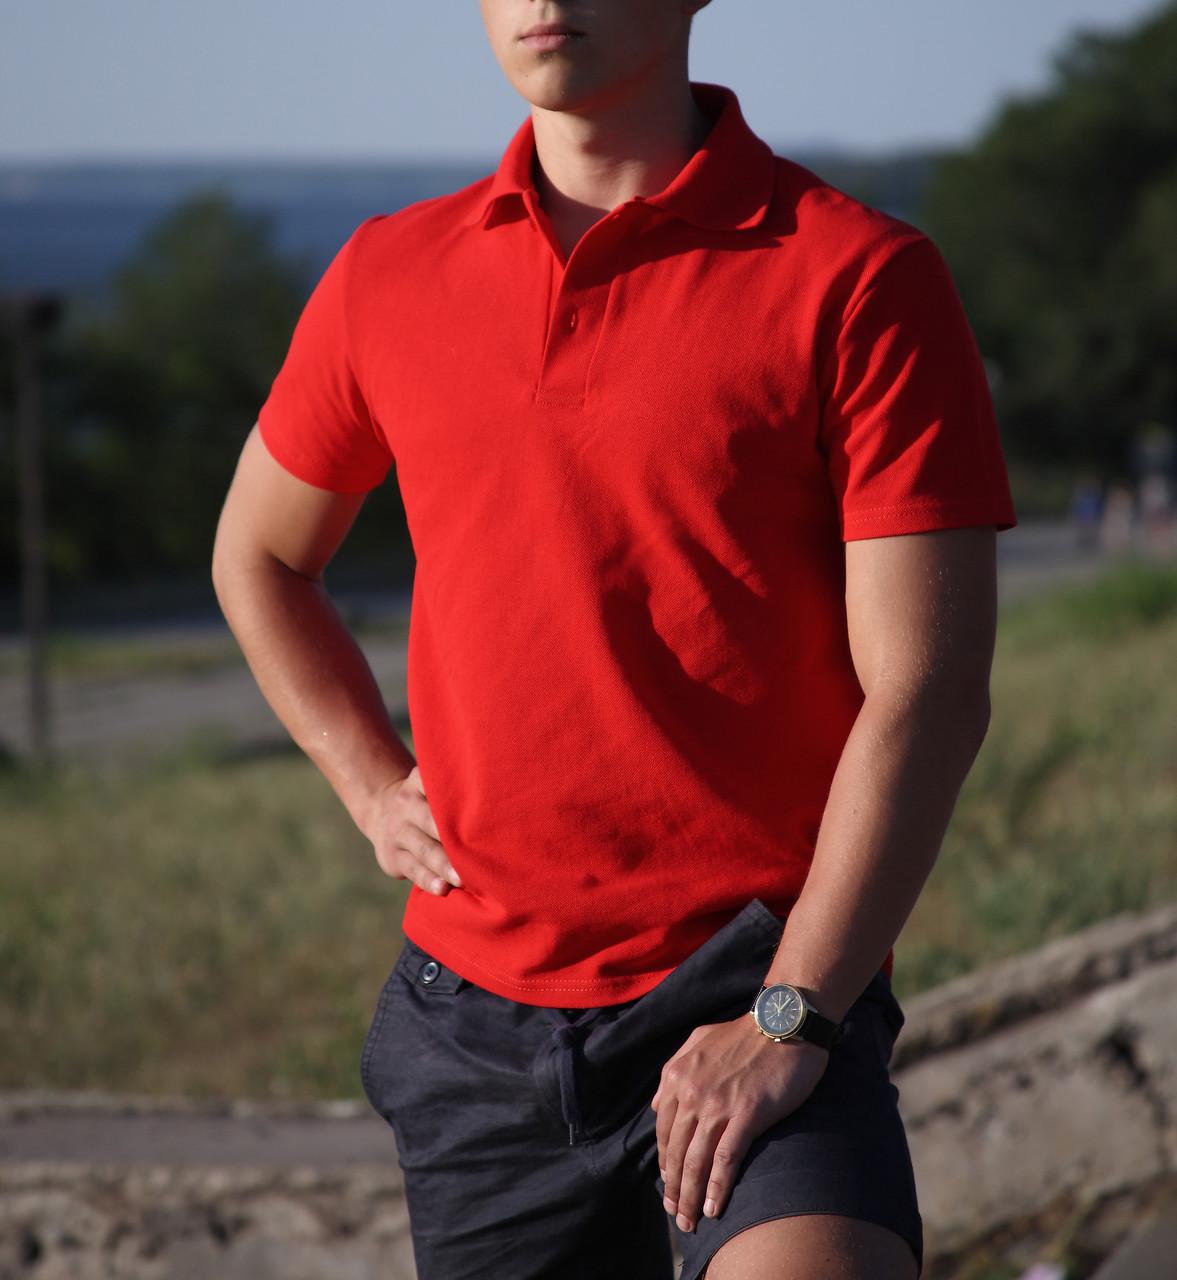 Bono Мужская футболка Поло красная 400080